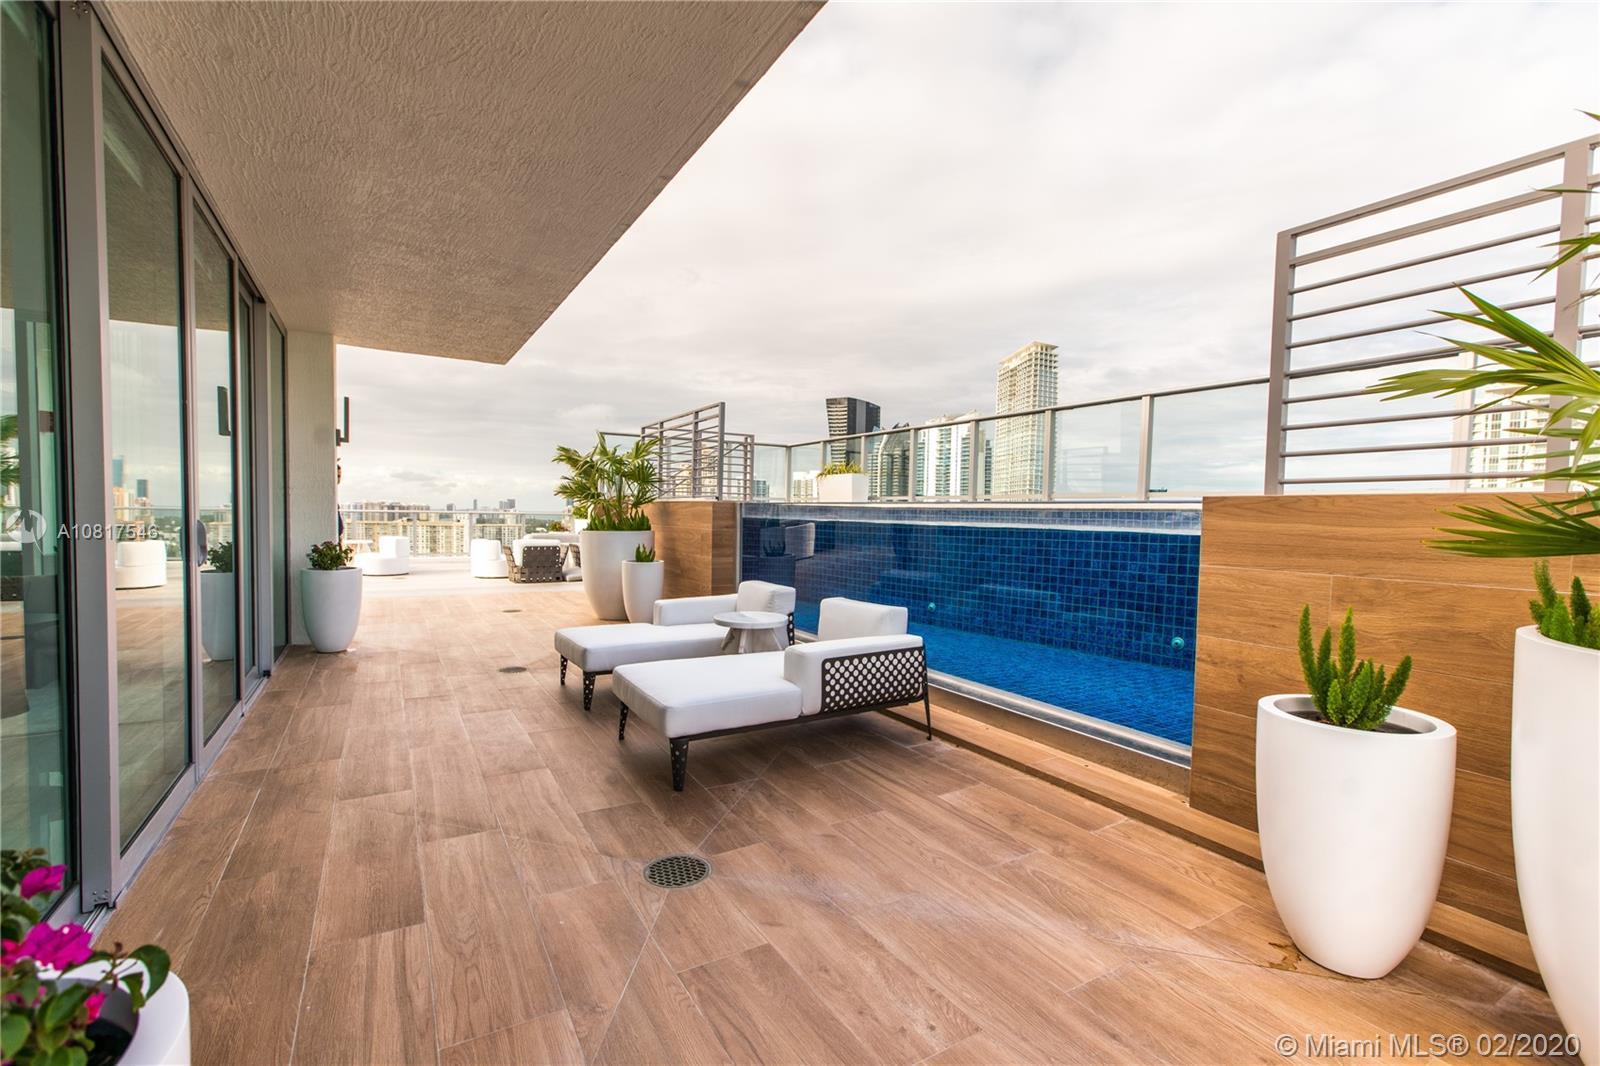 300 Sunny Isles Blvd, Unit #TS1 Luxury Real Estate